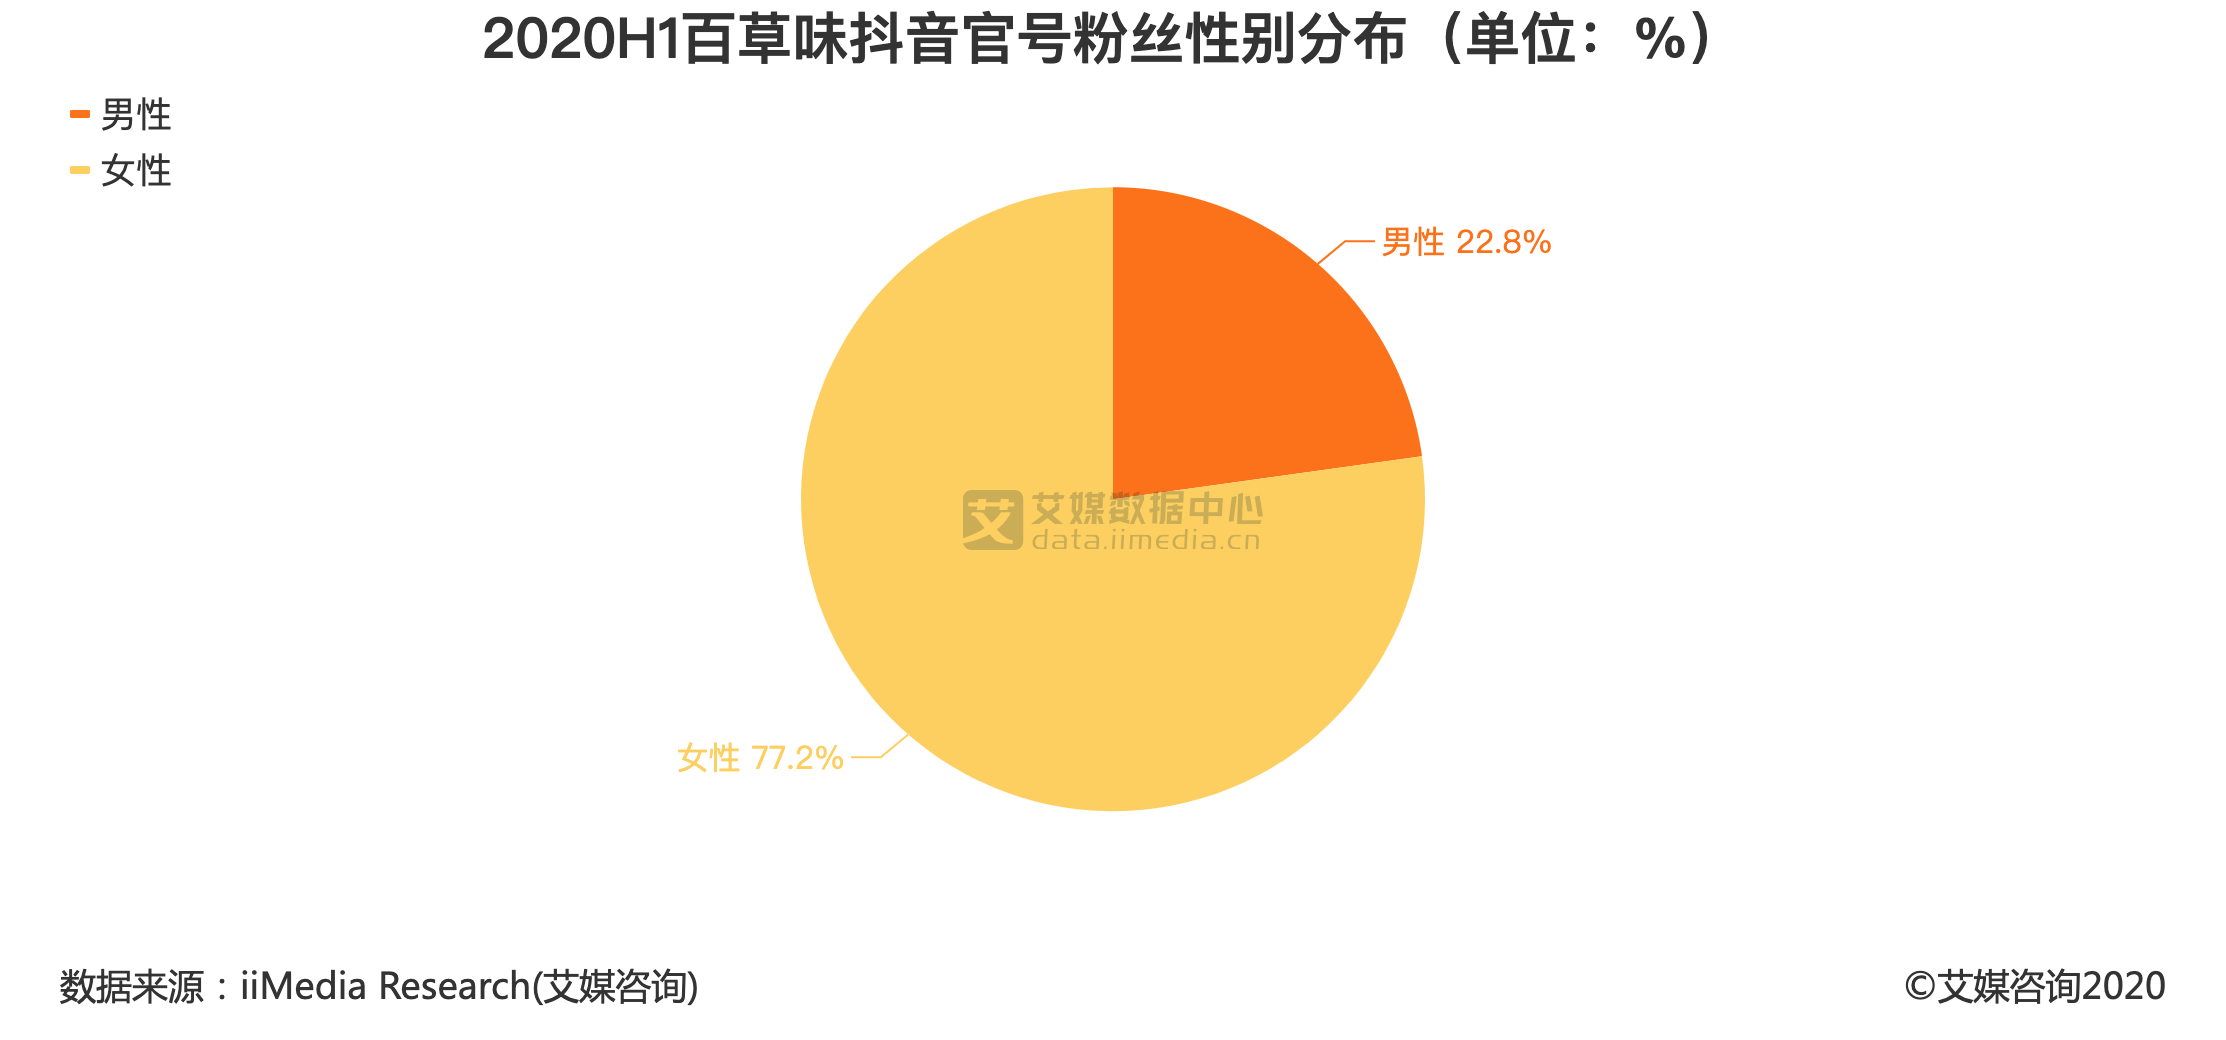 2020H1百草味抖音官号粉丝性别分布(单位:%)